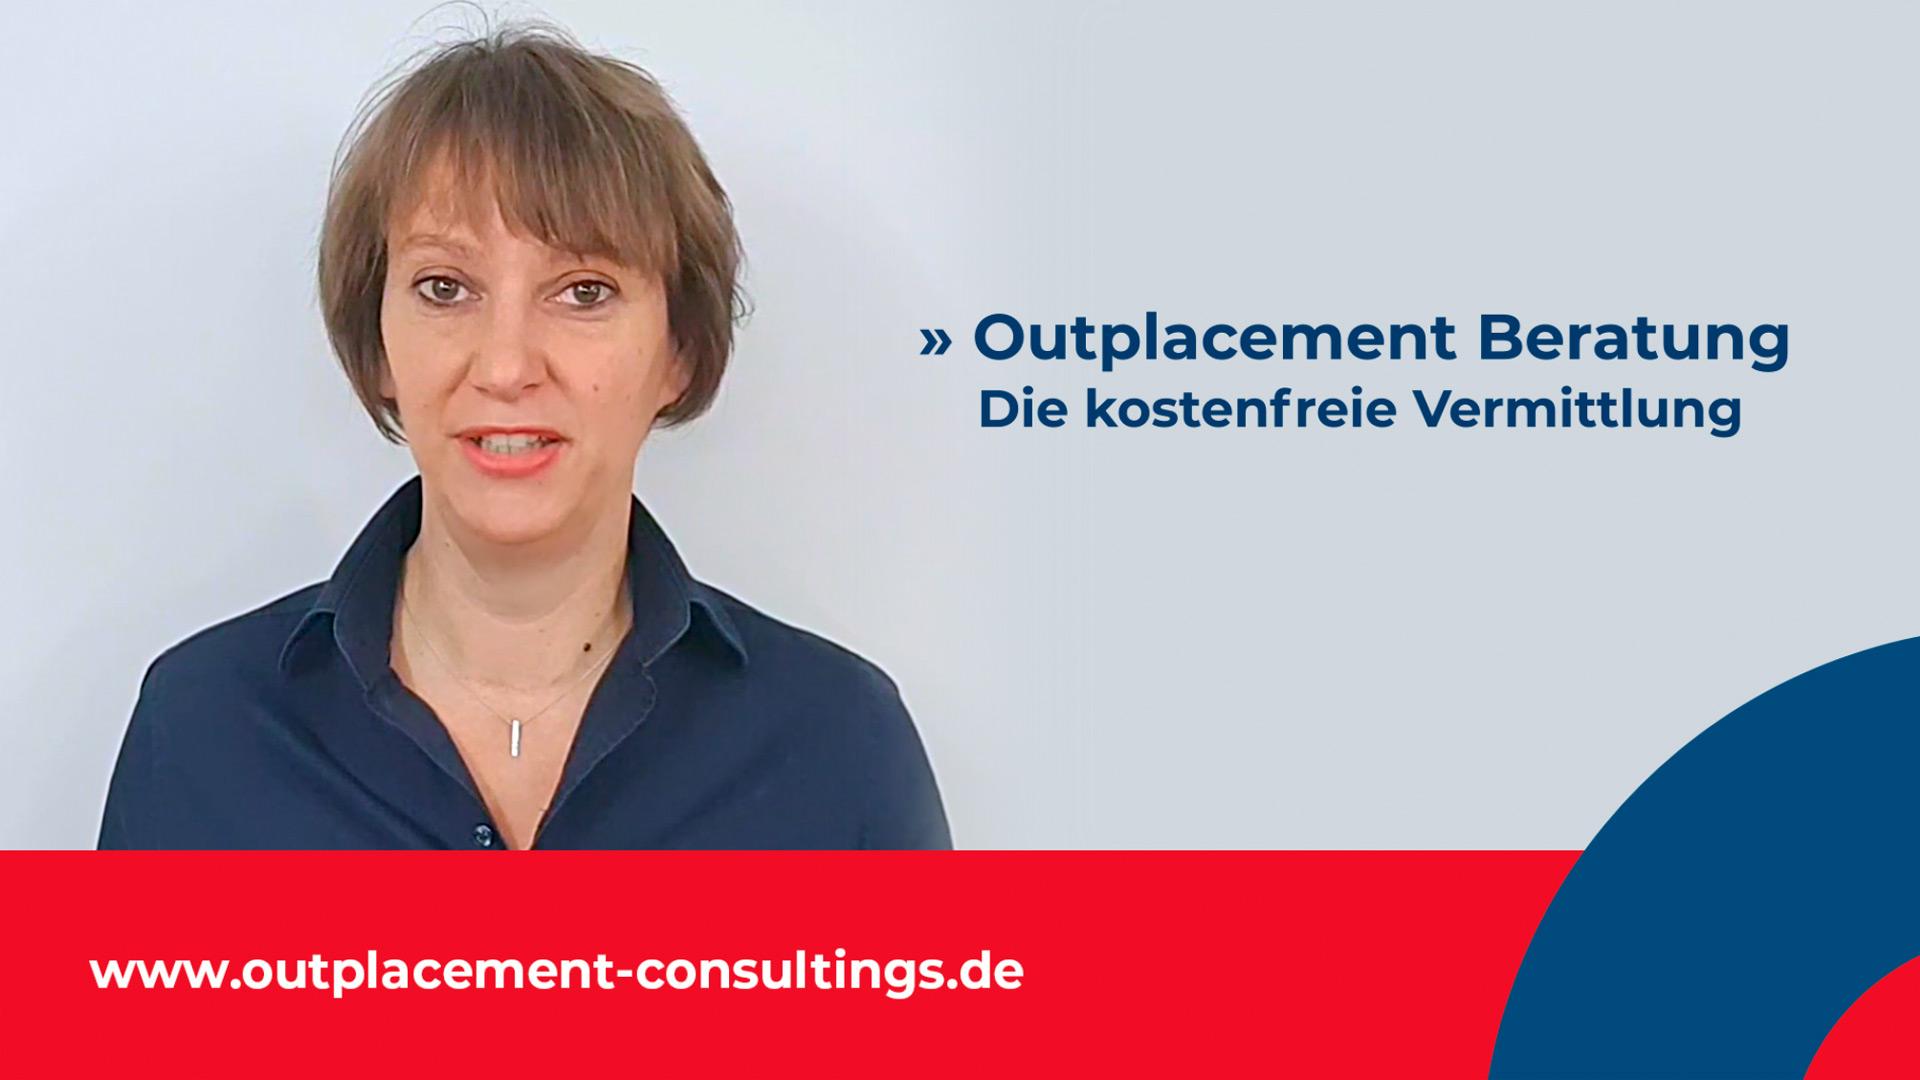 Outplacement Consulting Beraterin stellt sich vor / Portrait